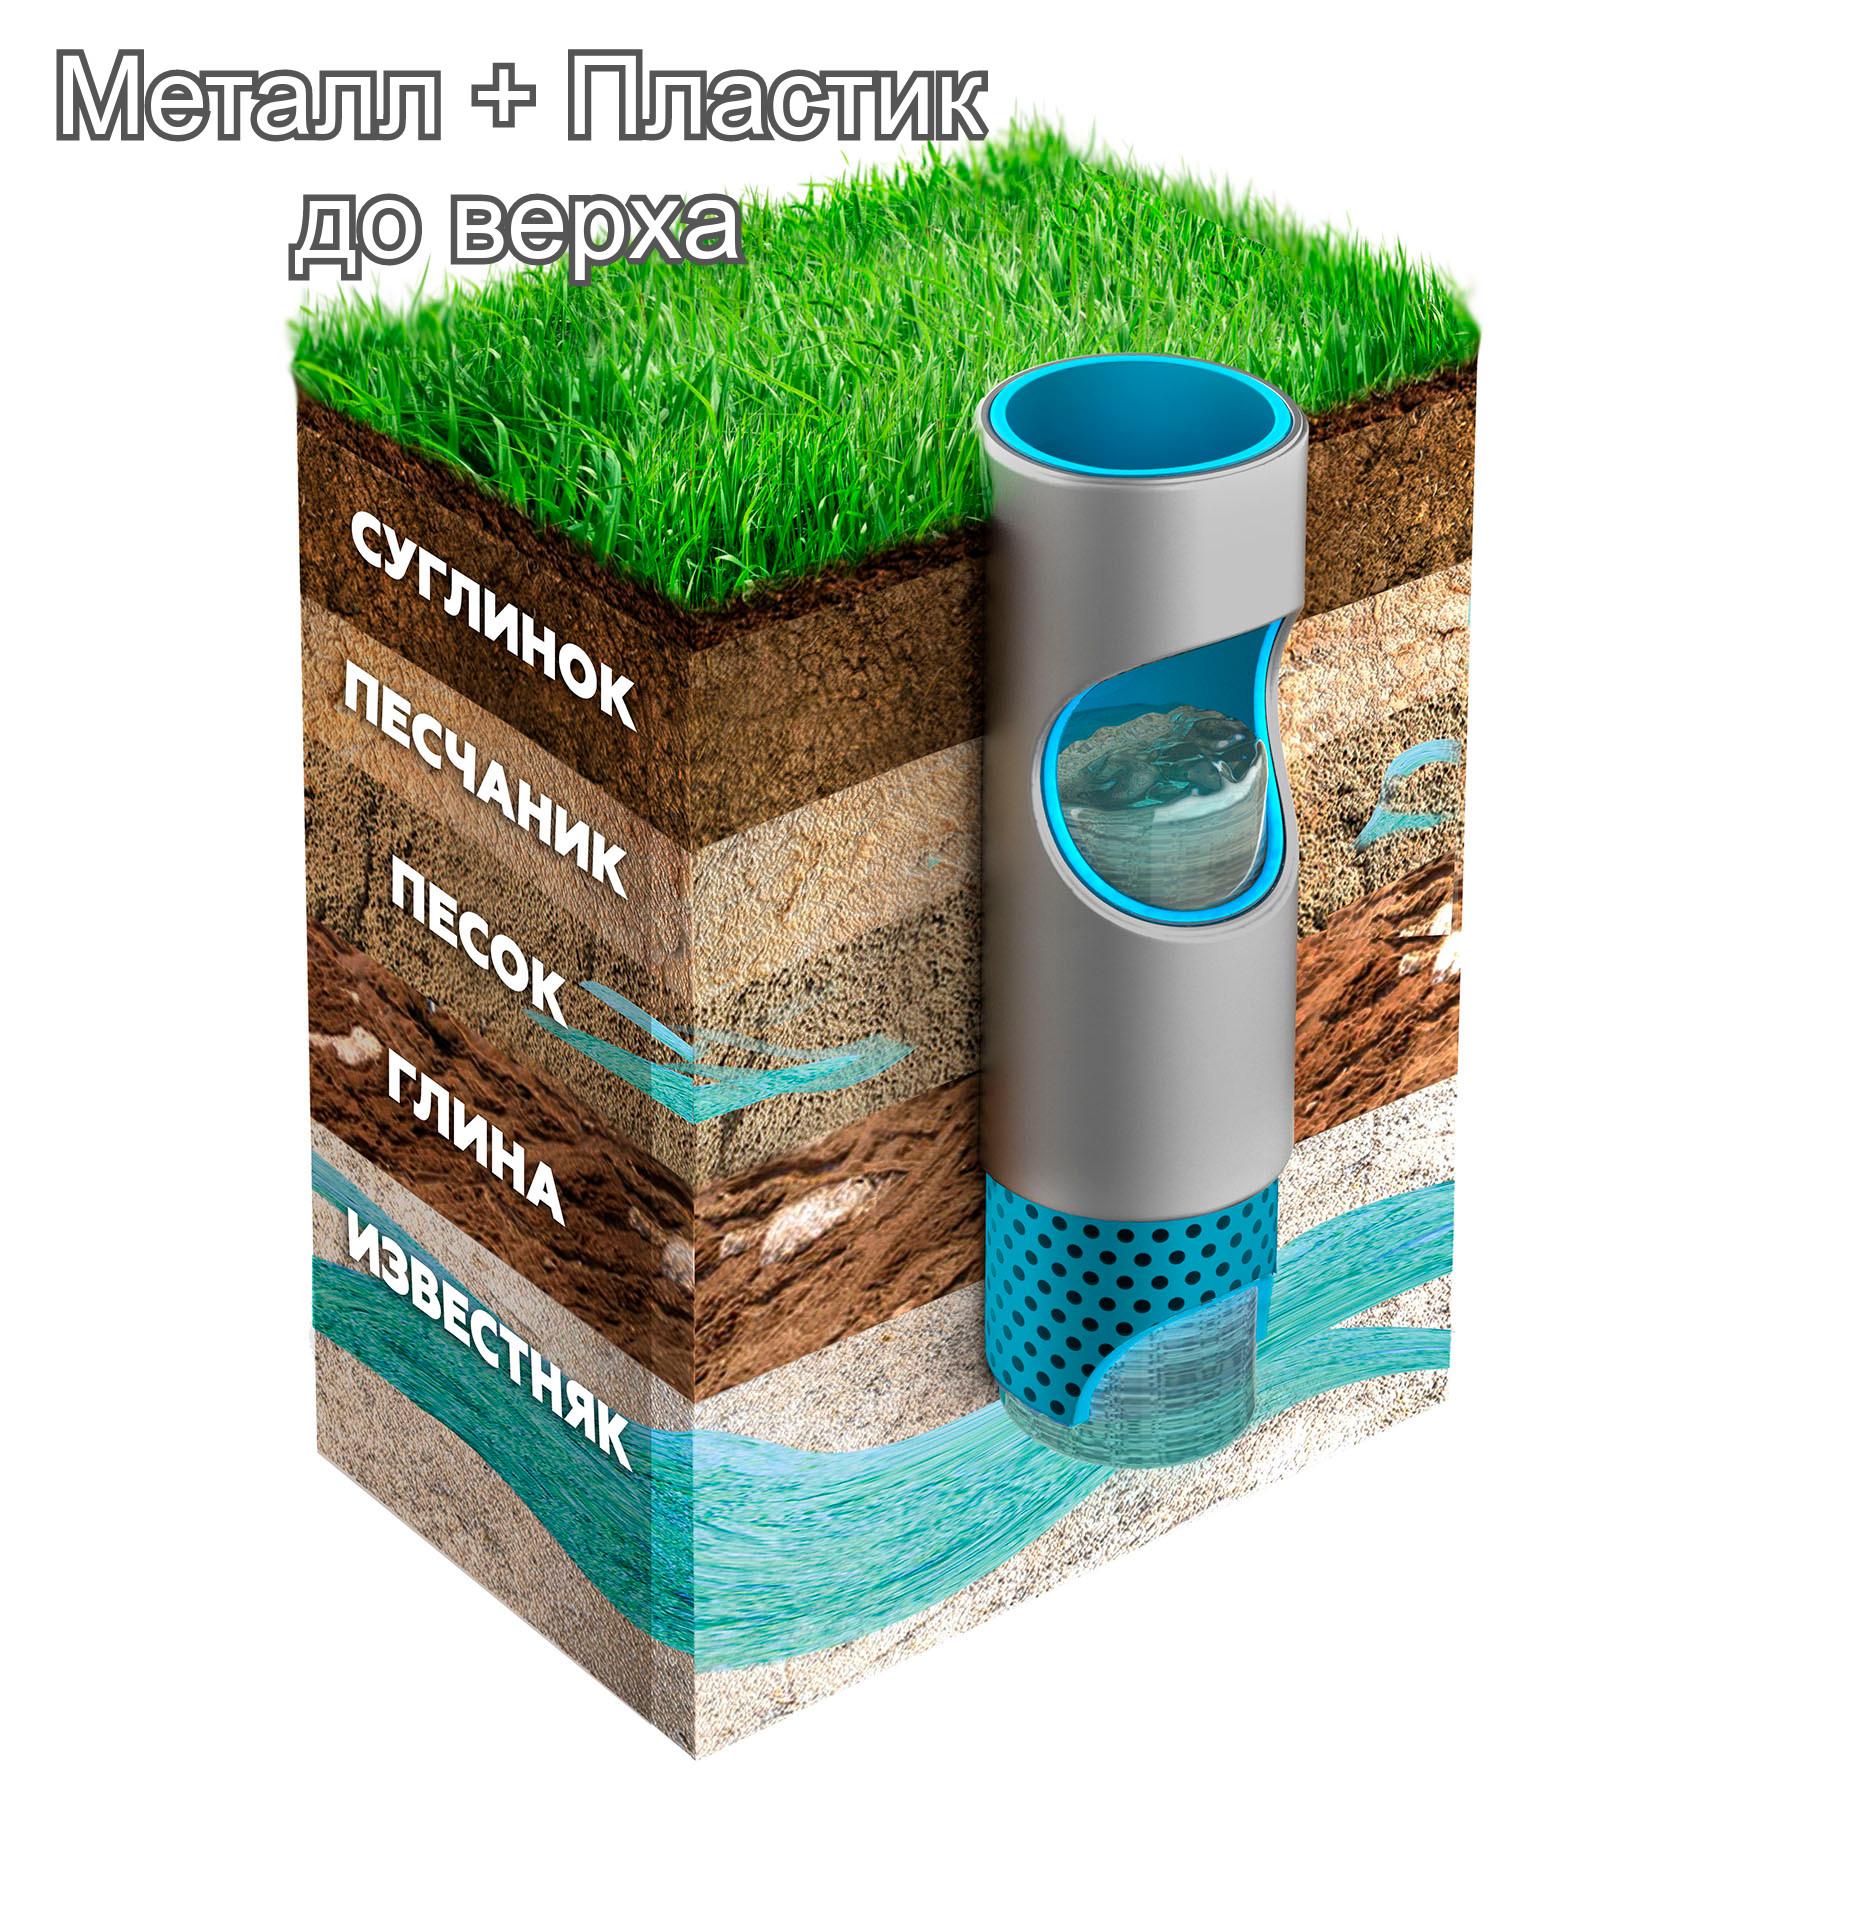 Артезианская скважина: Металл+Пластик